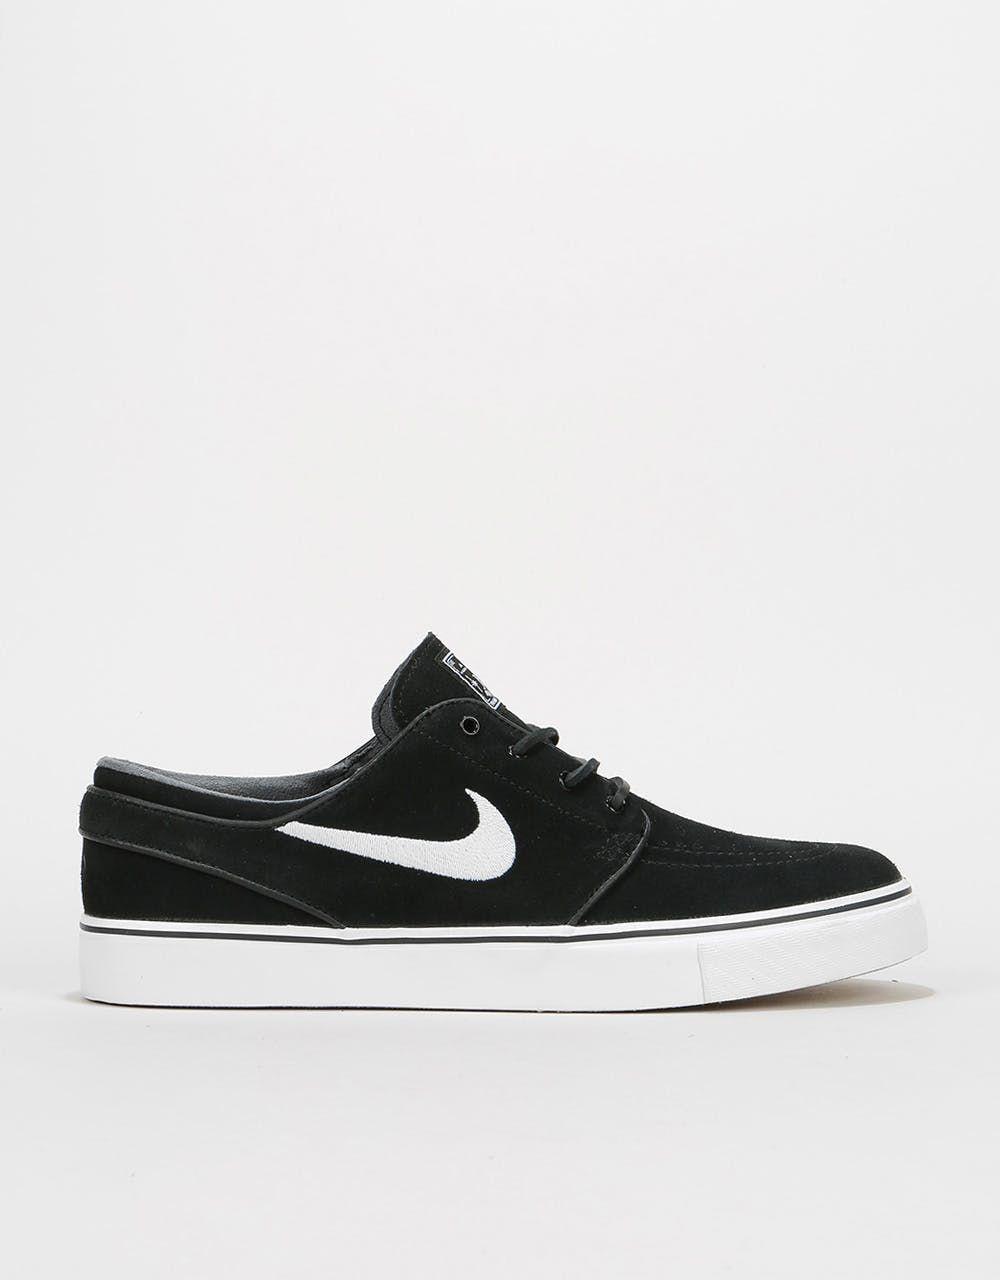 Nike SB Stefan Janoski OG Skate Shoes